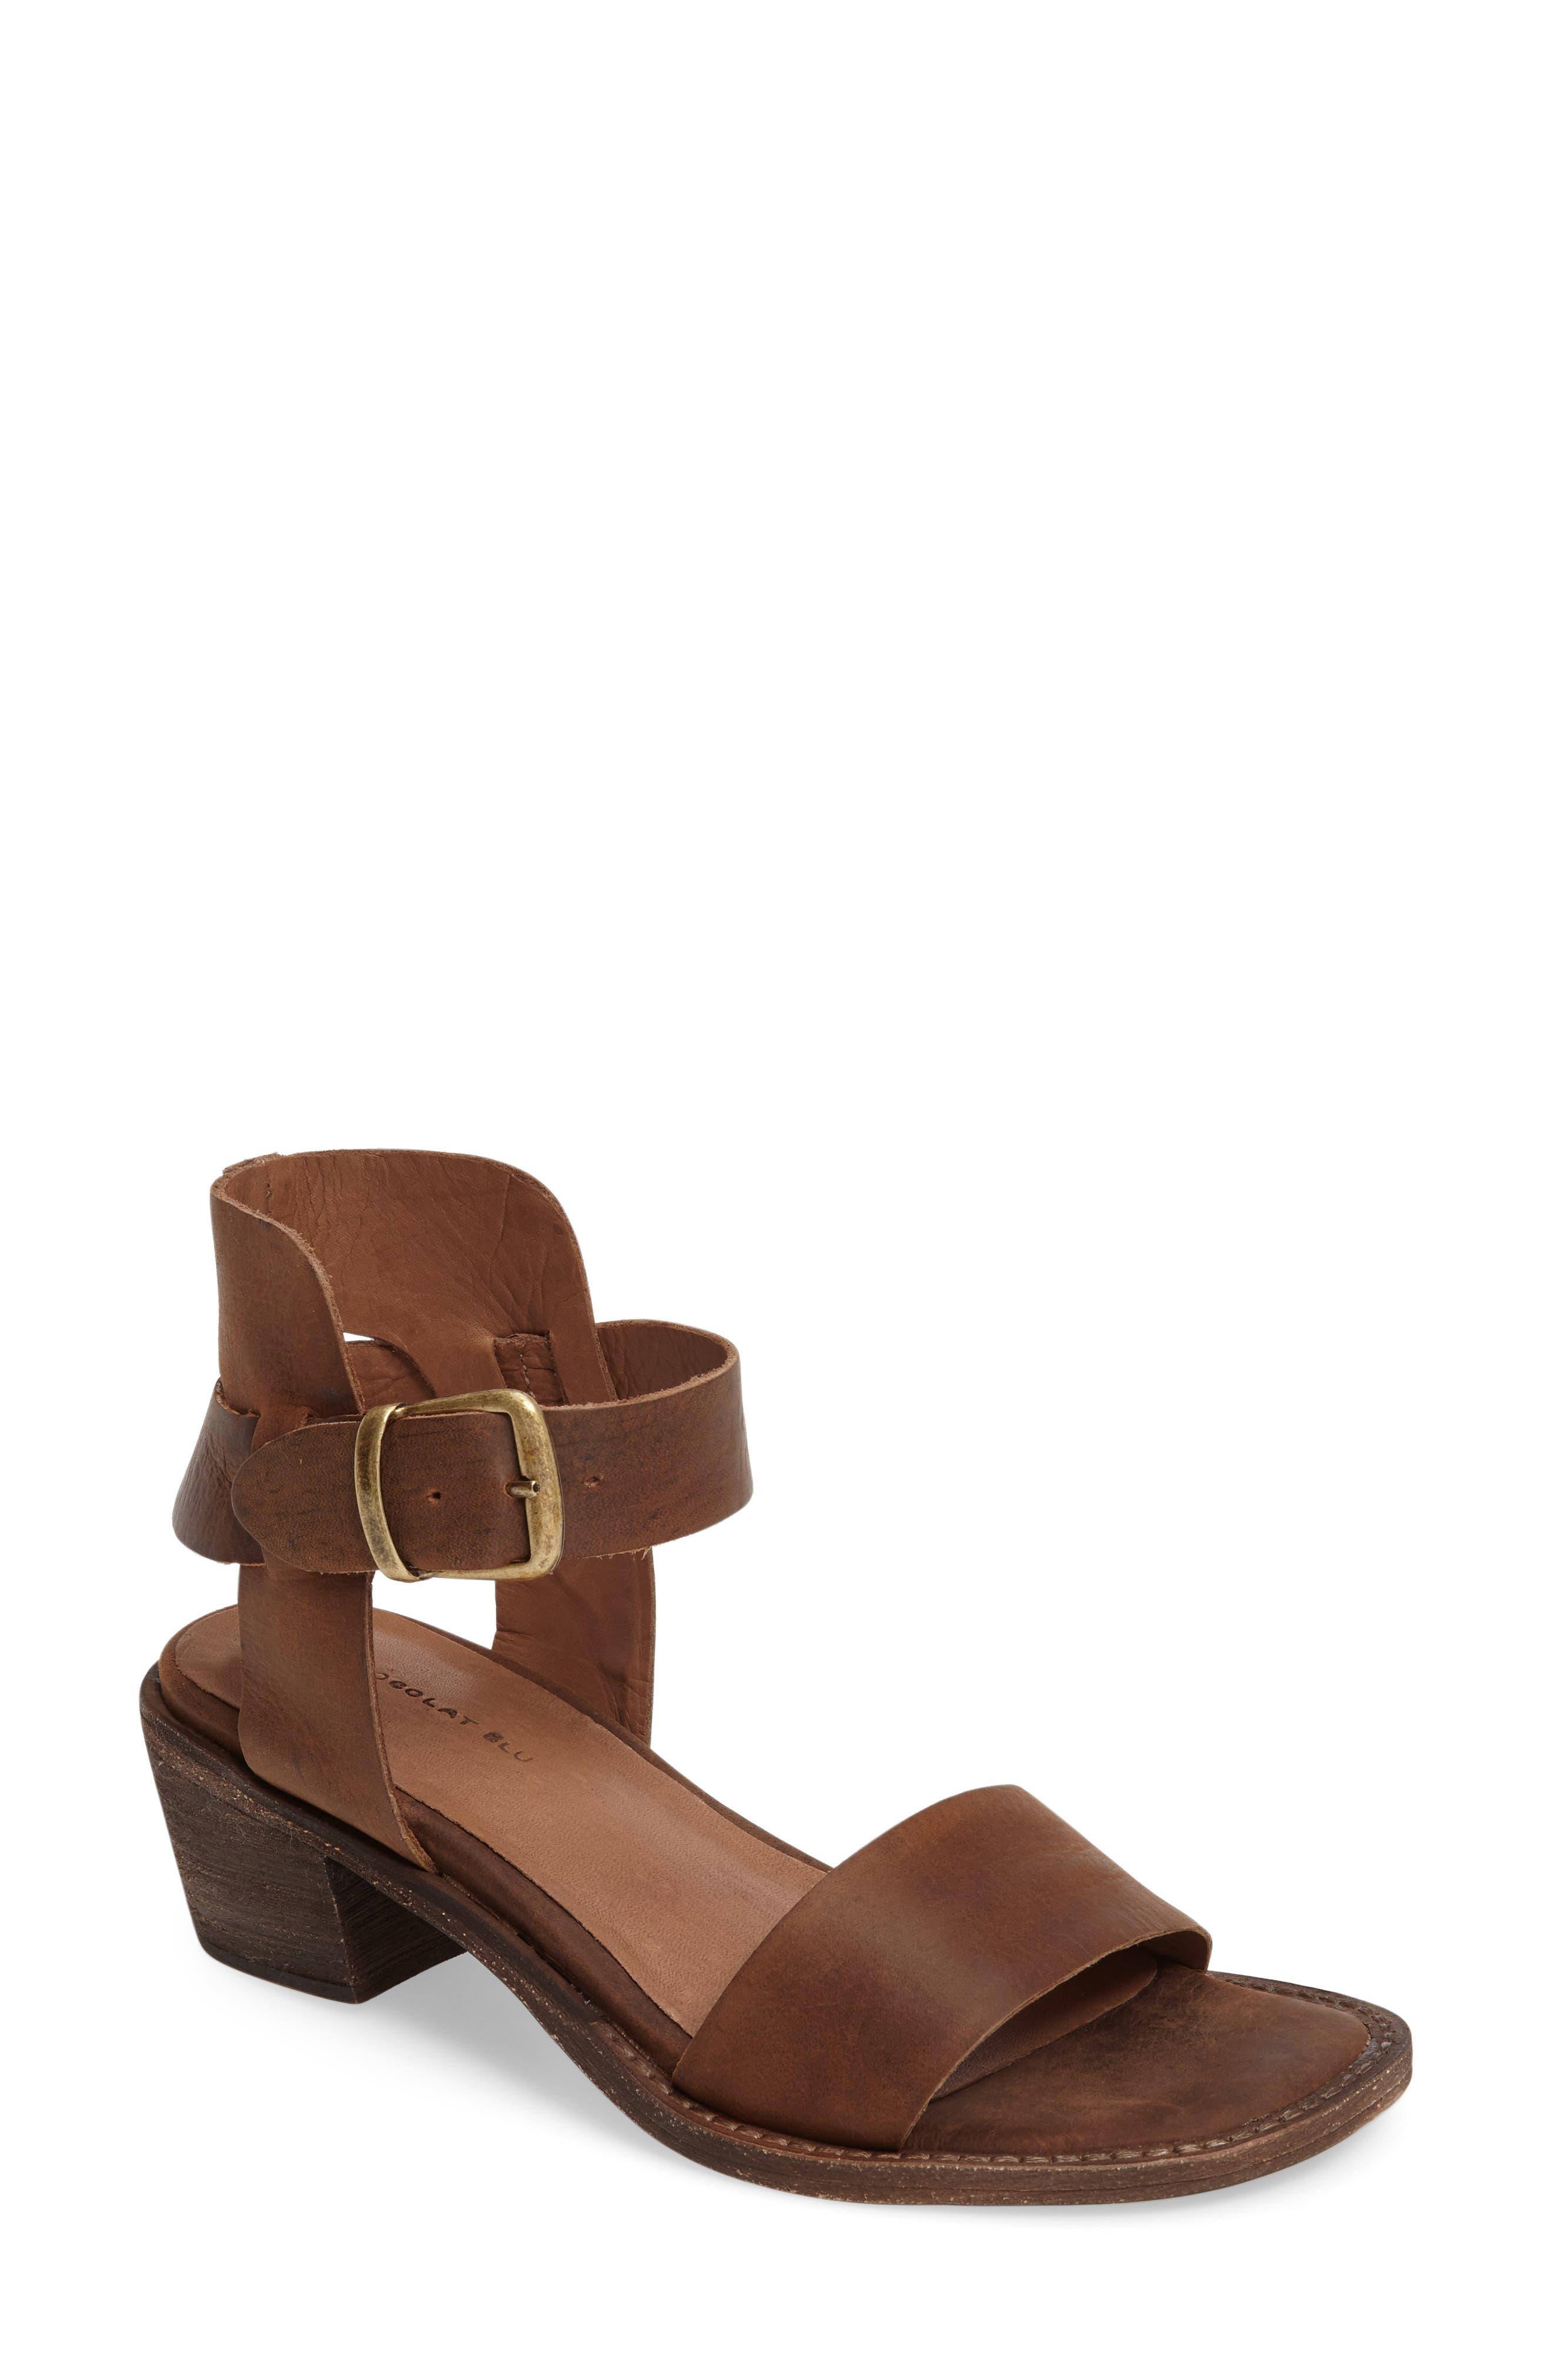 Main Image - Chocolat Blu Arcadia Block Heel Sandal (Women)